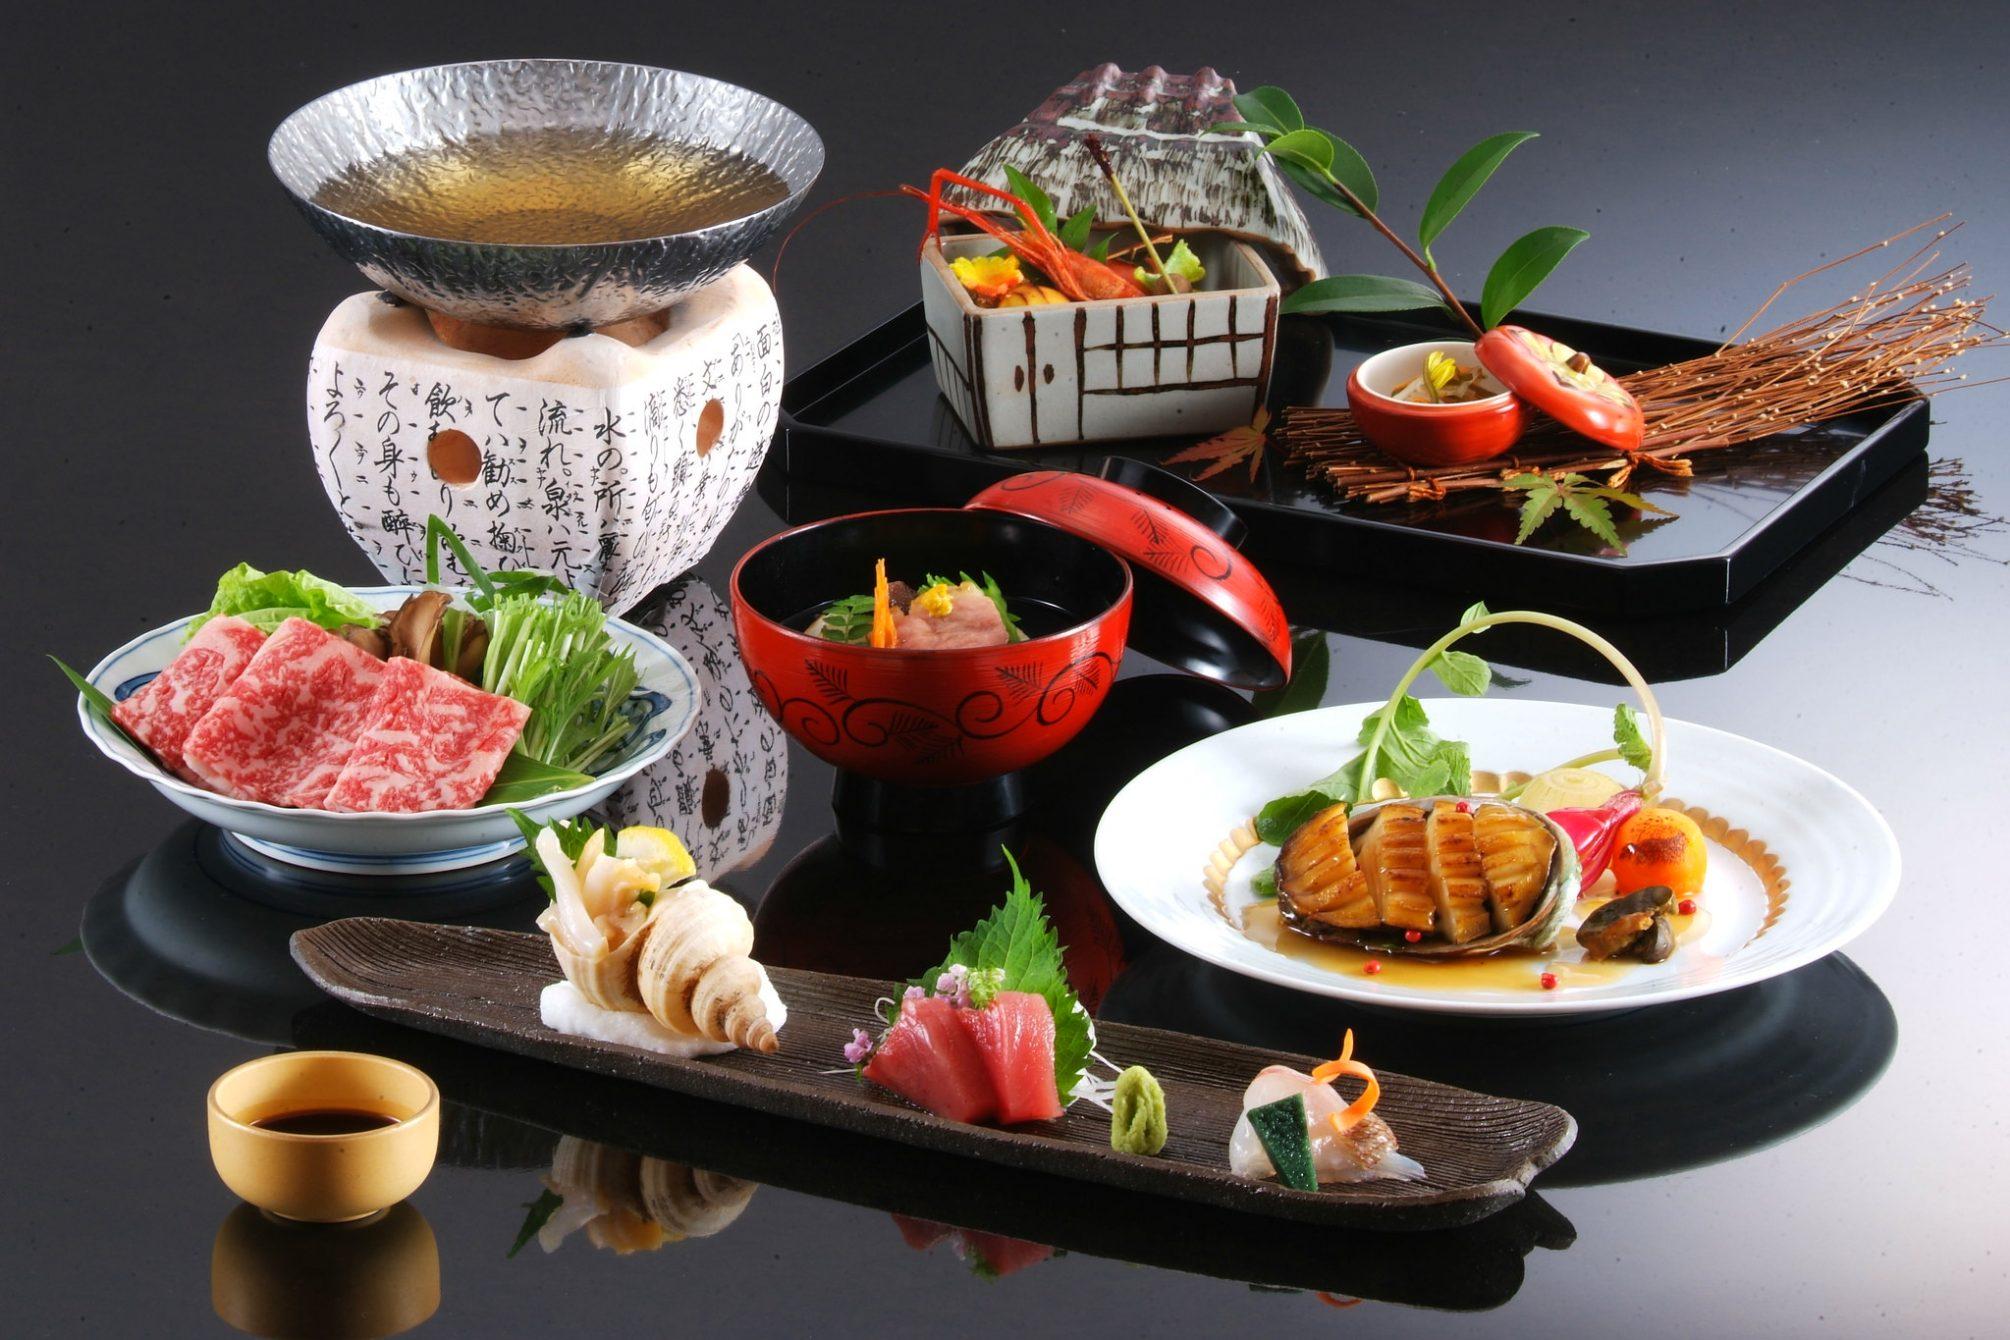 kaiseki ryori japanisches Essen